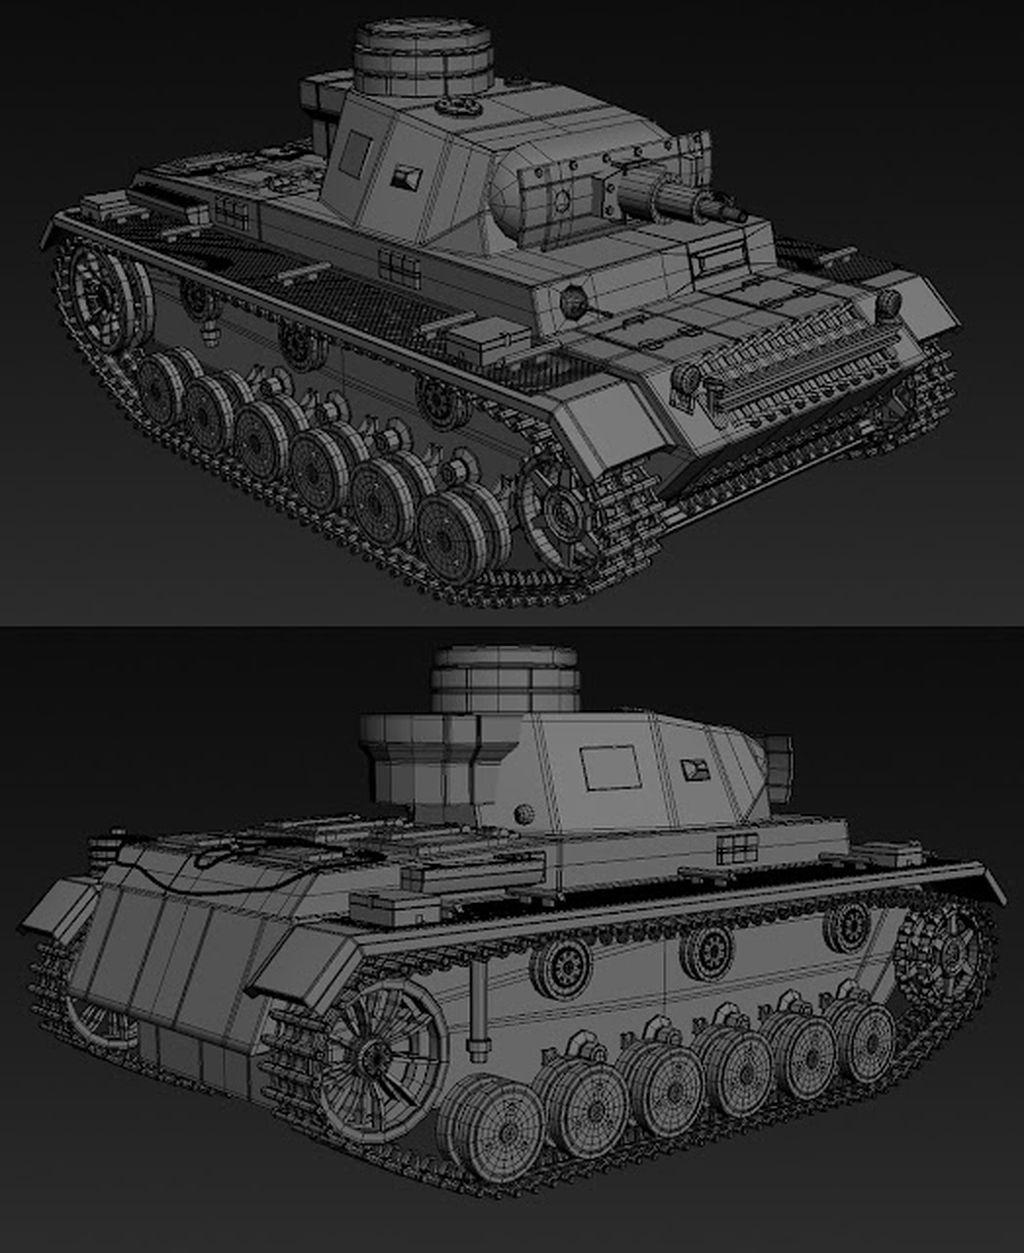 Panzer III WW2 German tank